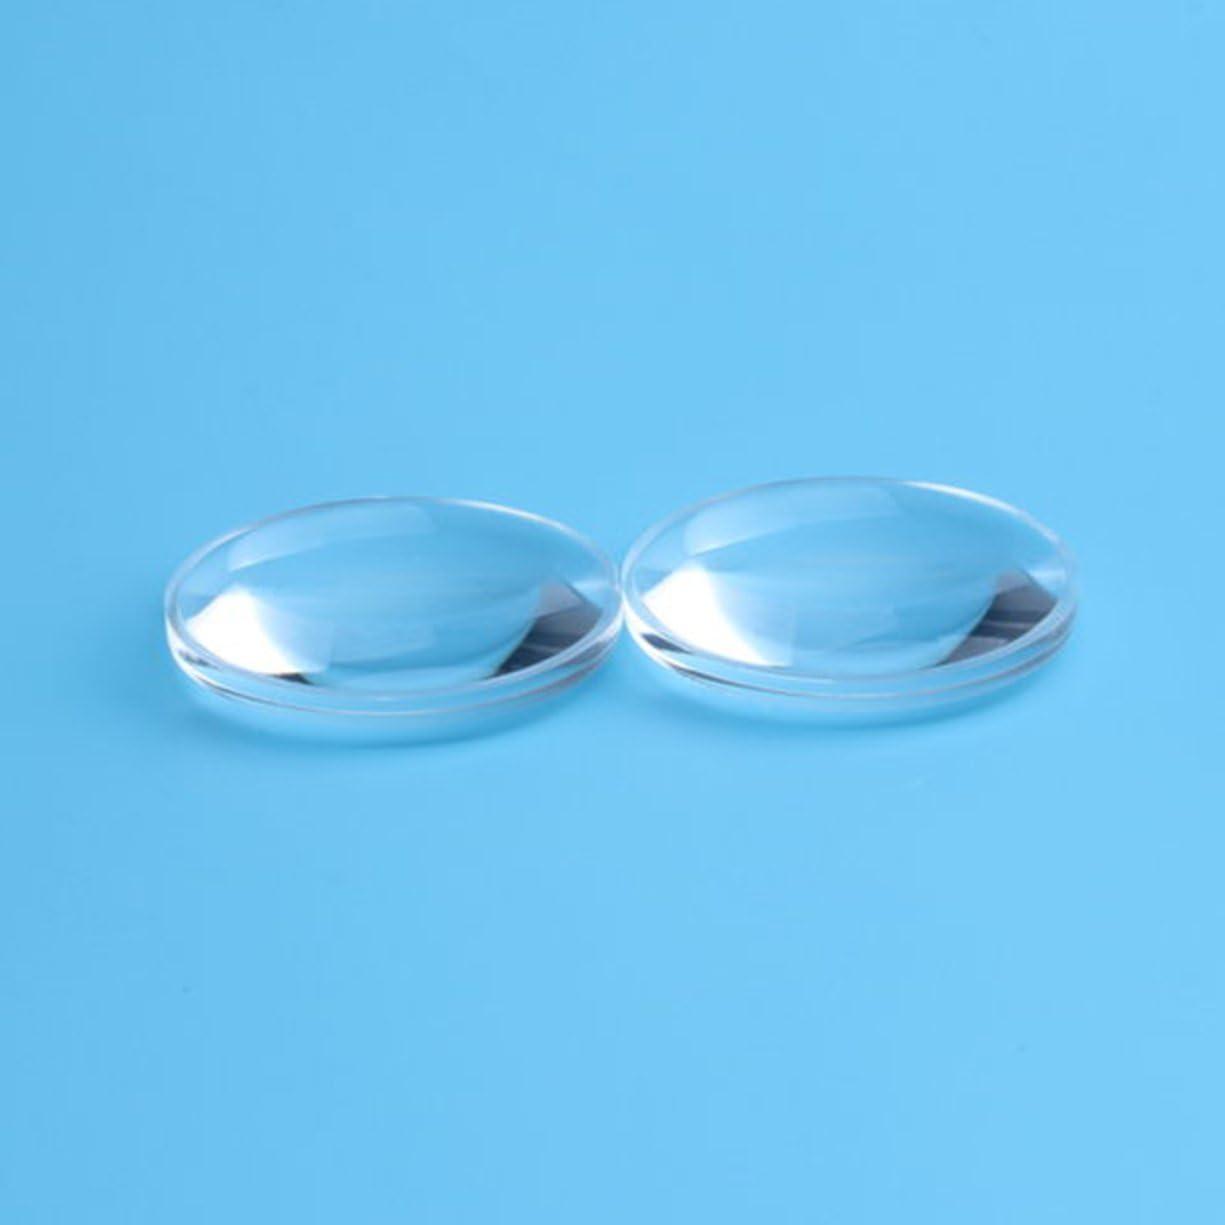 1PCS 37mm Dia Double Aspheric Convex Lens 45mm Focal Length Virtual Reality VR Biconvex Lens Optics Lens for Camera Projector